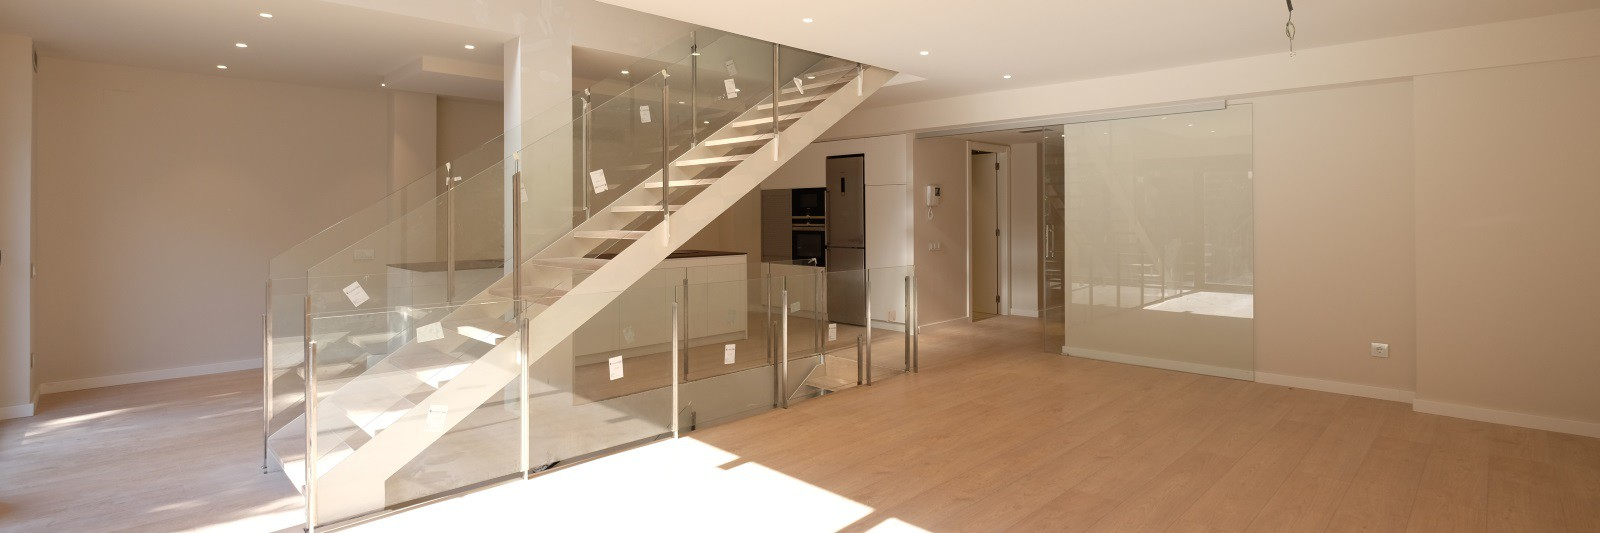 MG Inmobiliaria Barcelona - obra-nueva